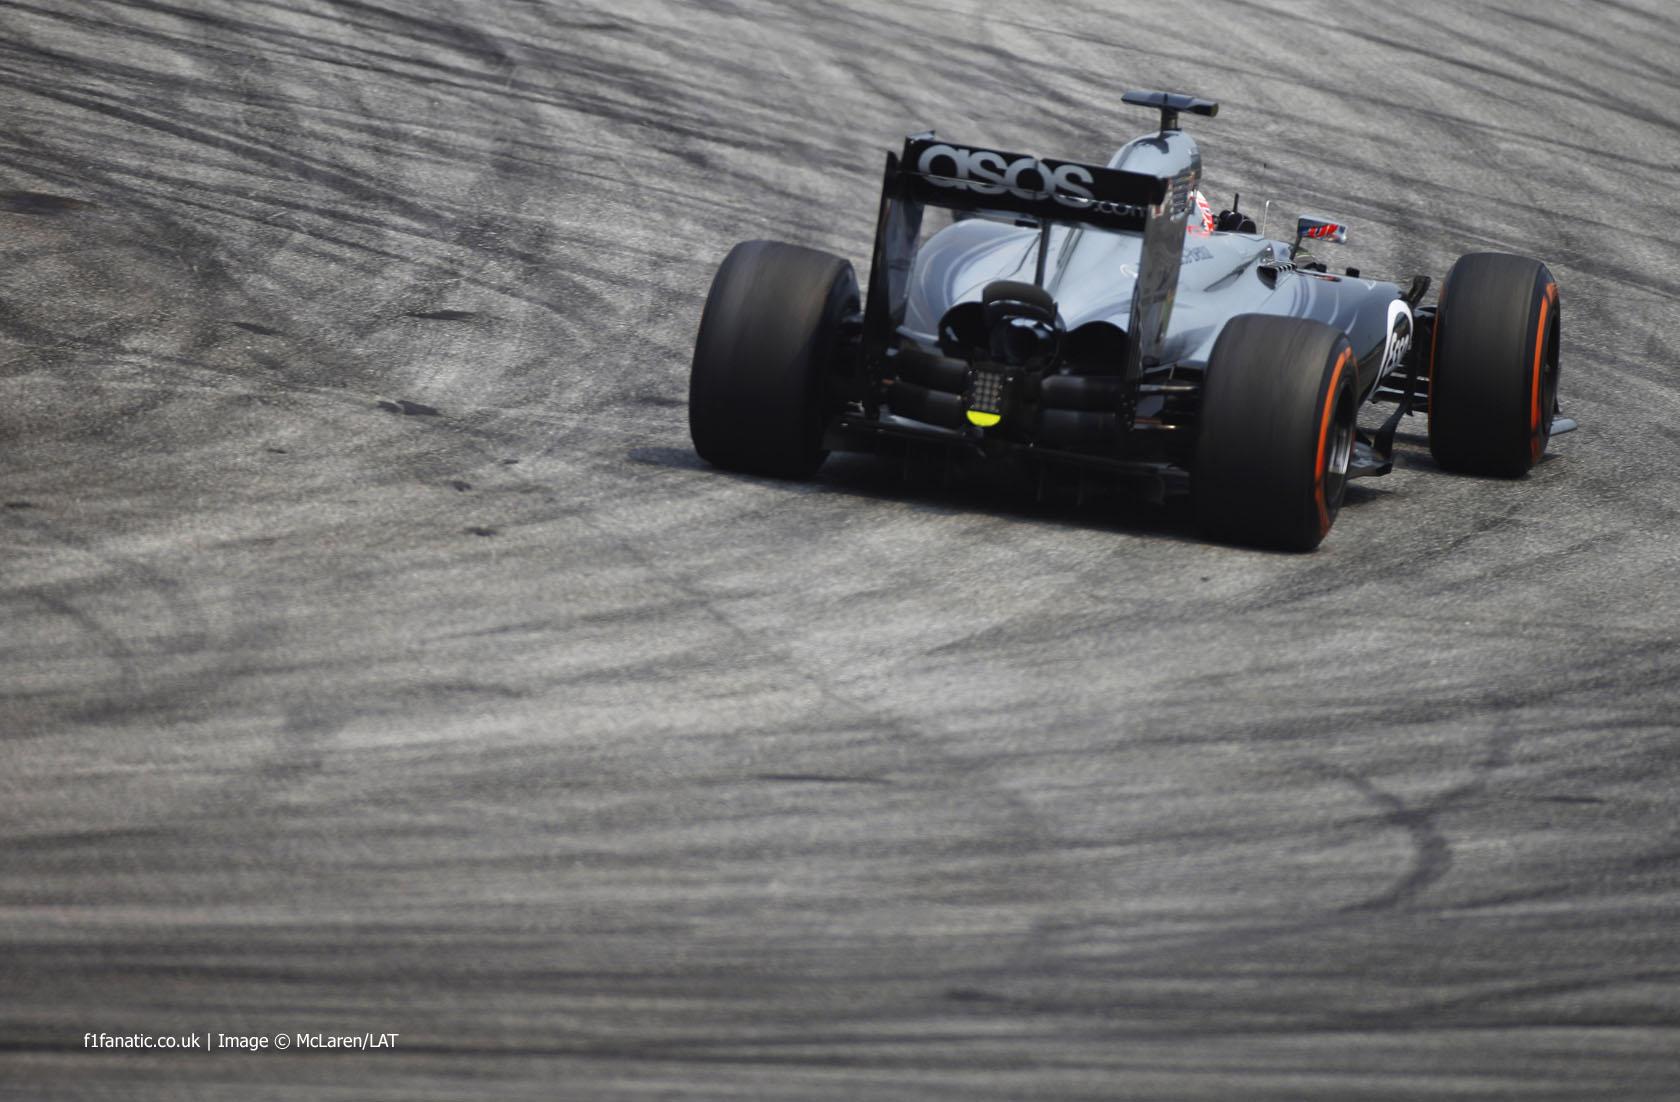 Jenson Button, McLaren, Sepang International Circuit, 2014